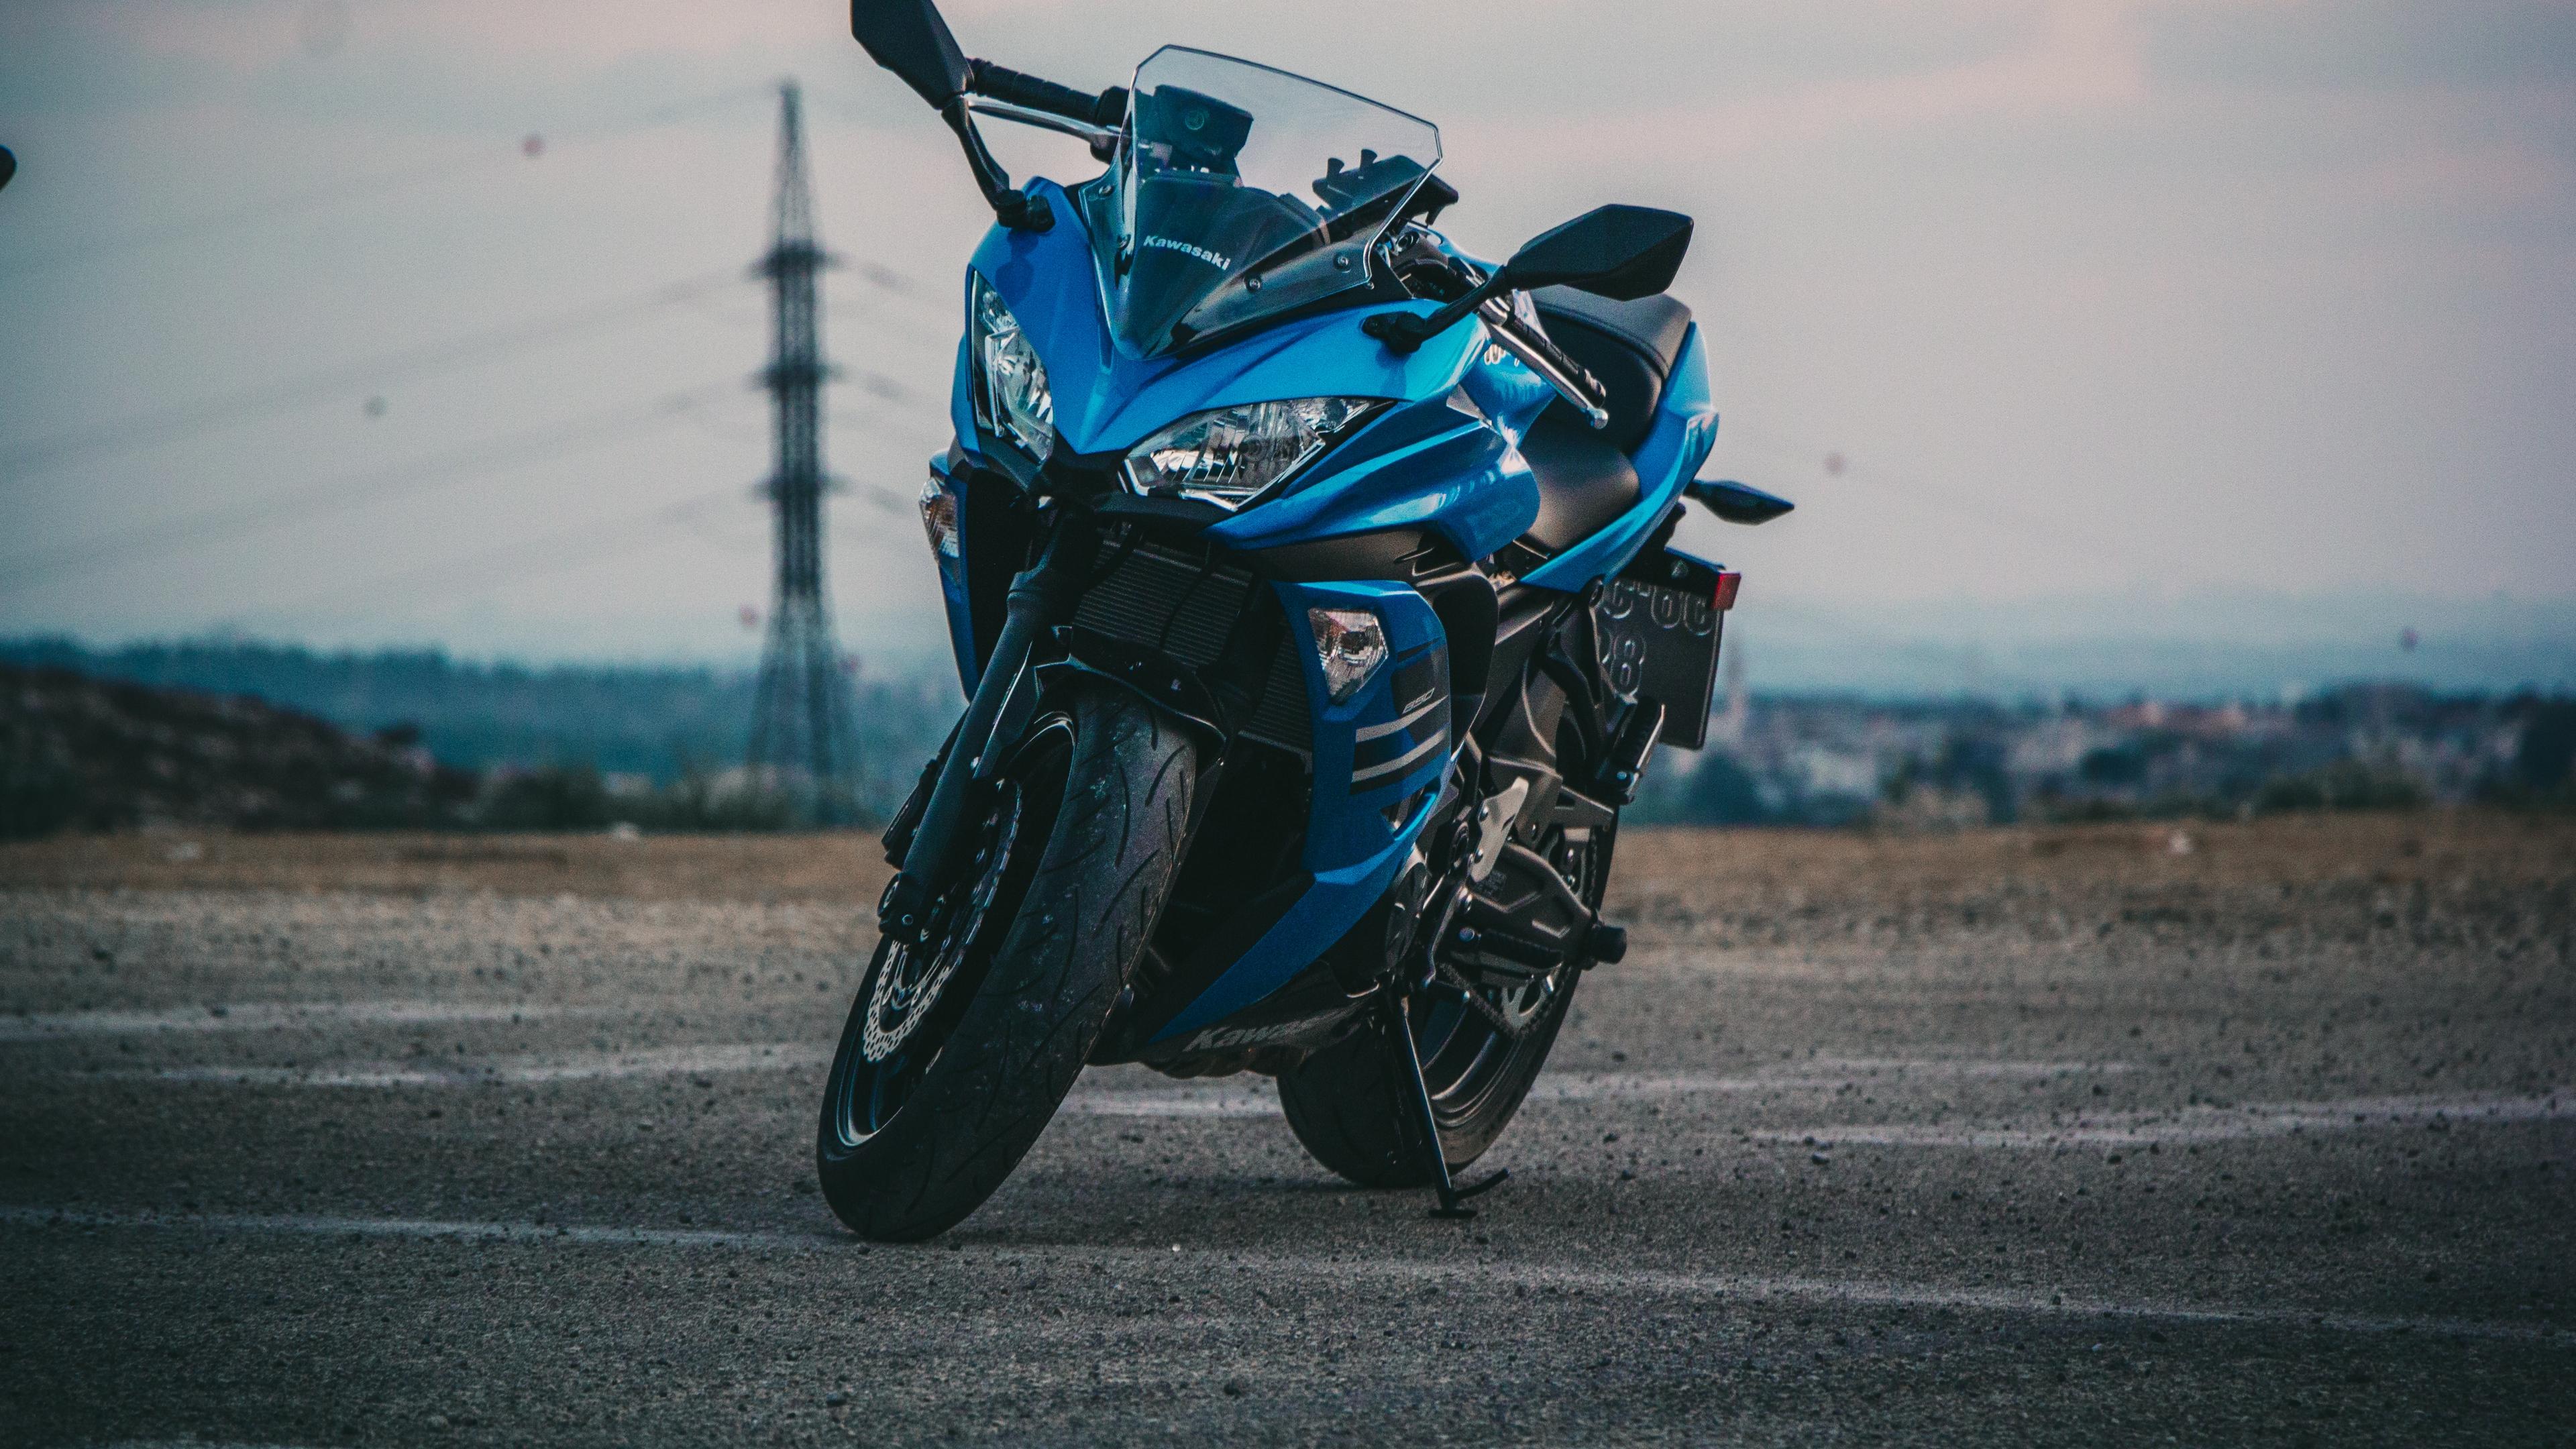 motorcycle bike stylish 4k 1536018836 - motorcycle, bike, stylish 4k - stylish, Motorcycle, Bike